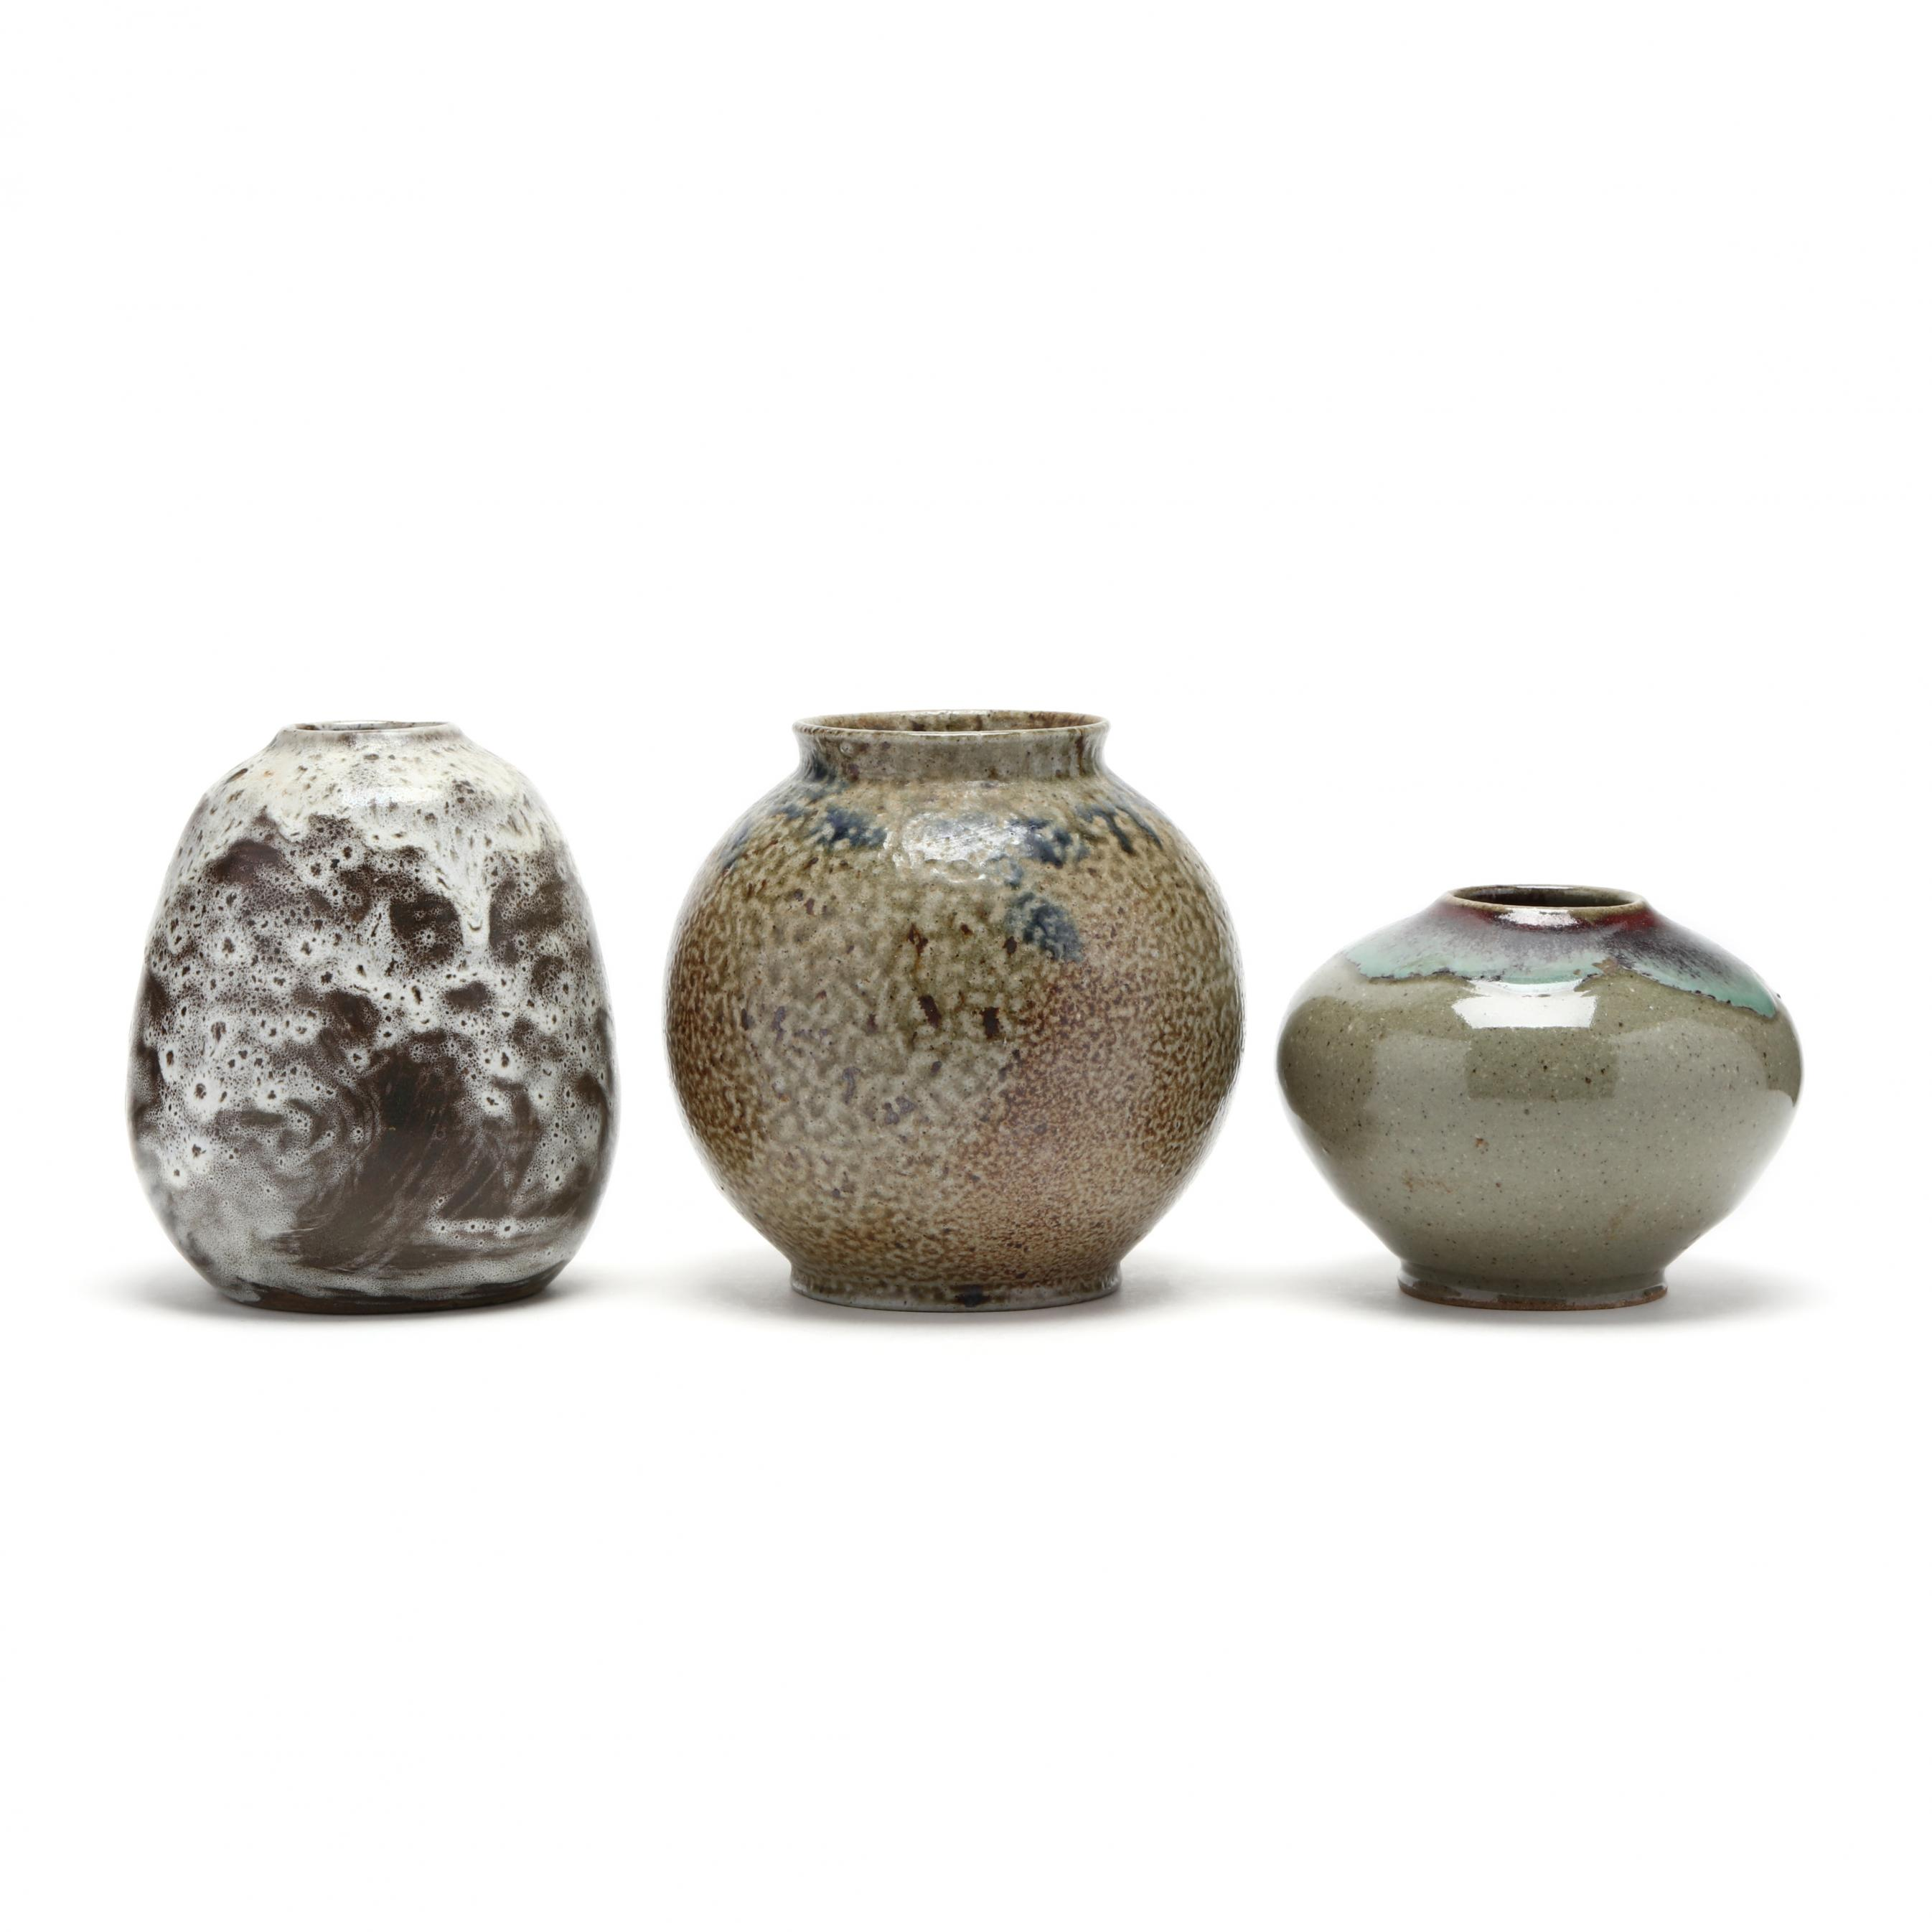 three-nc-pottery-vases-jugtown